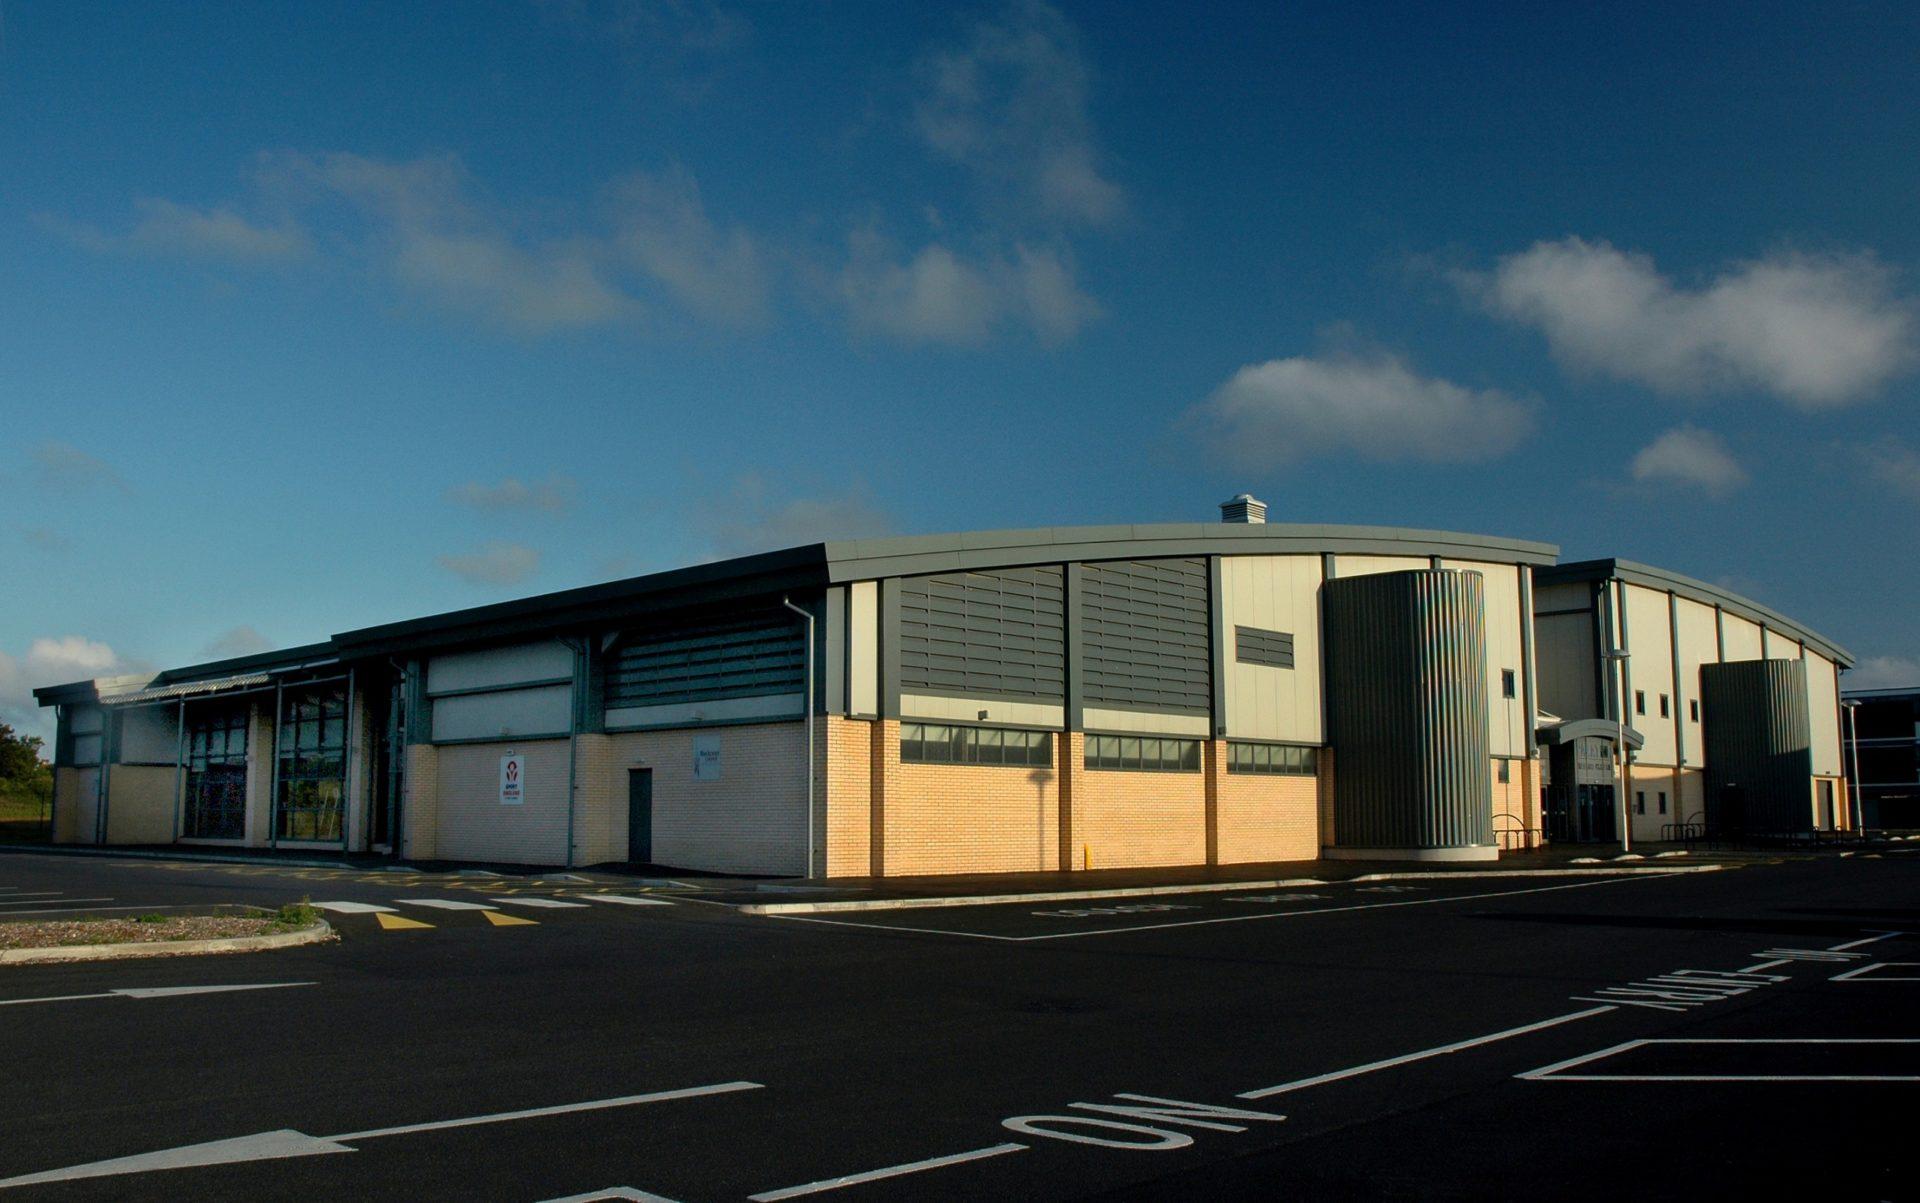 Palatine Leisure Centre, Blackpool, Lancashire